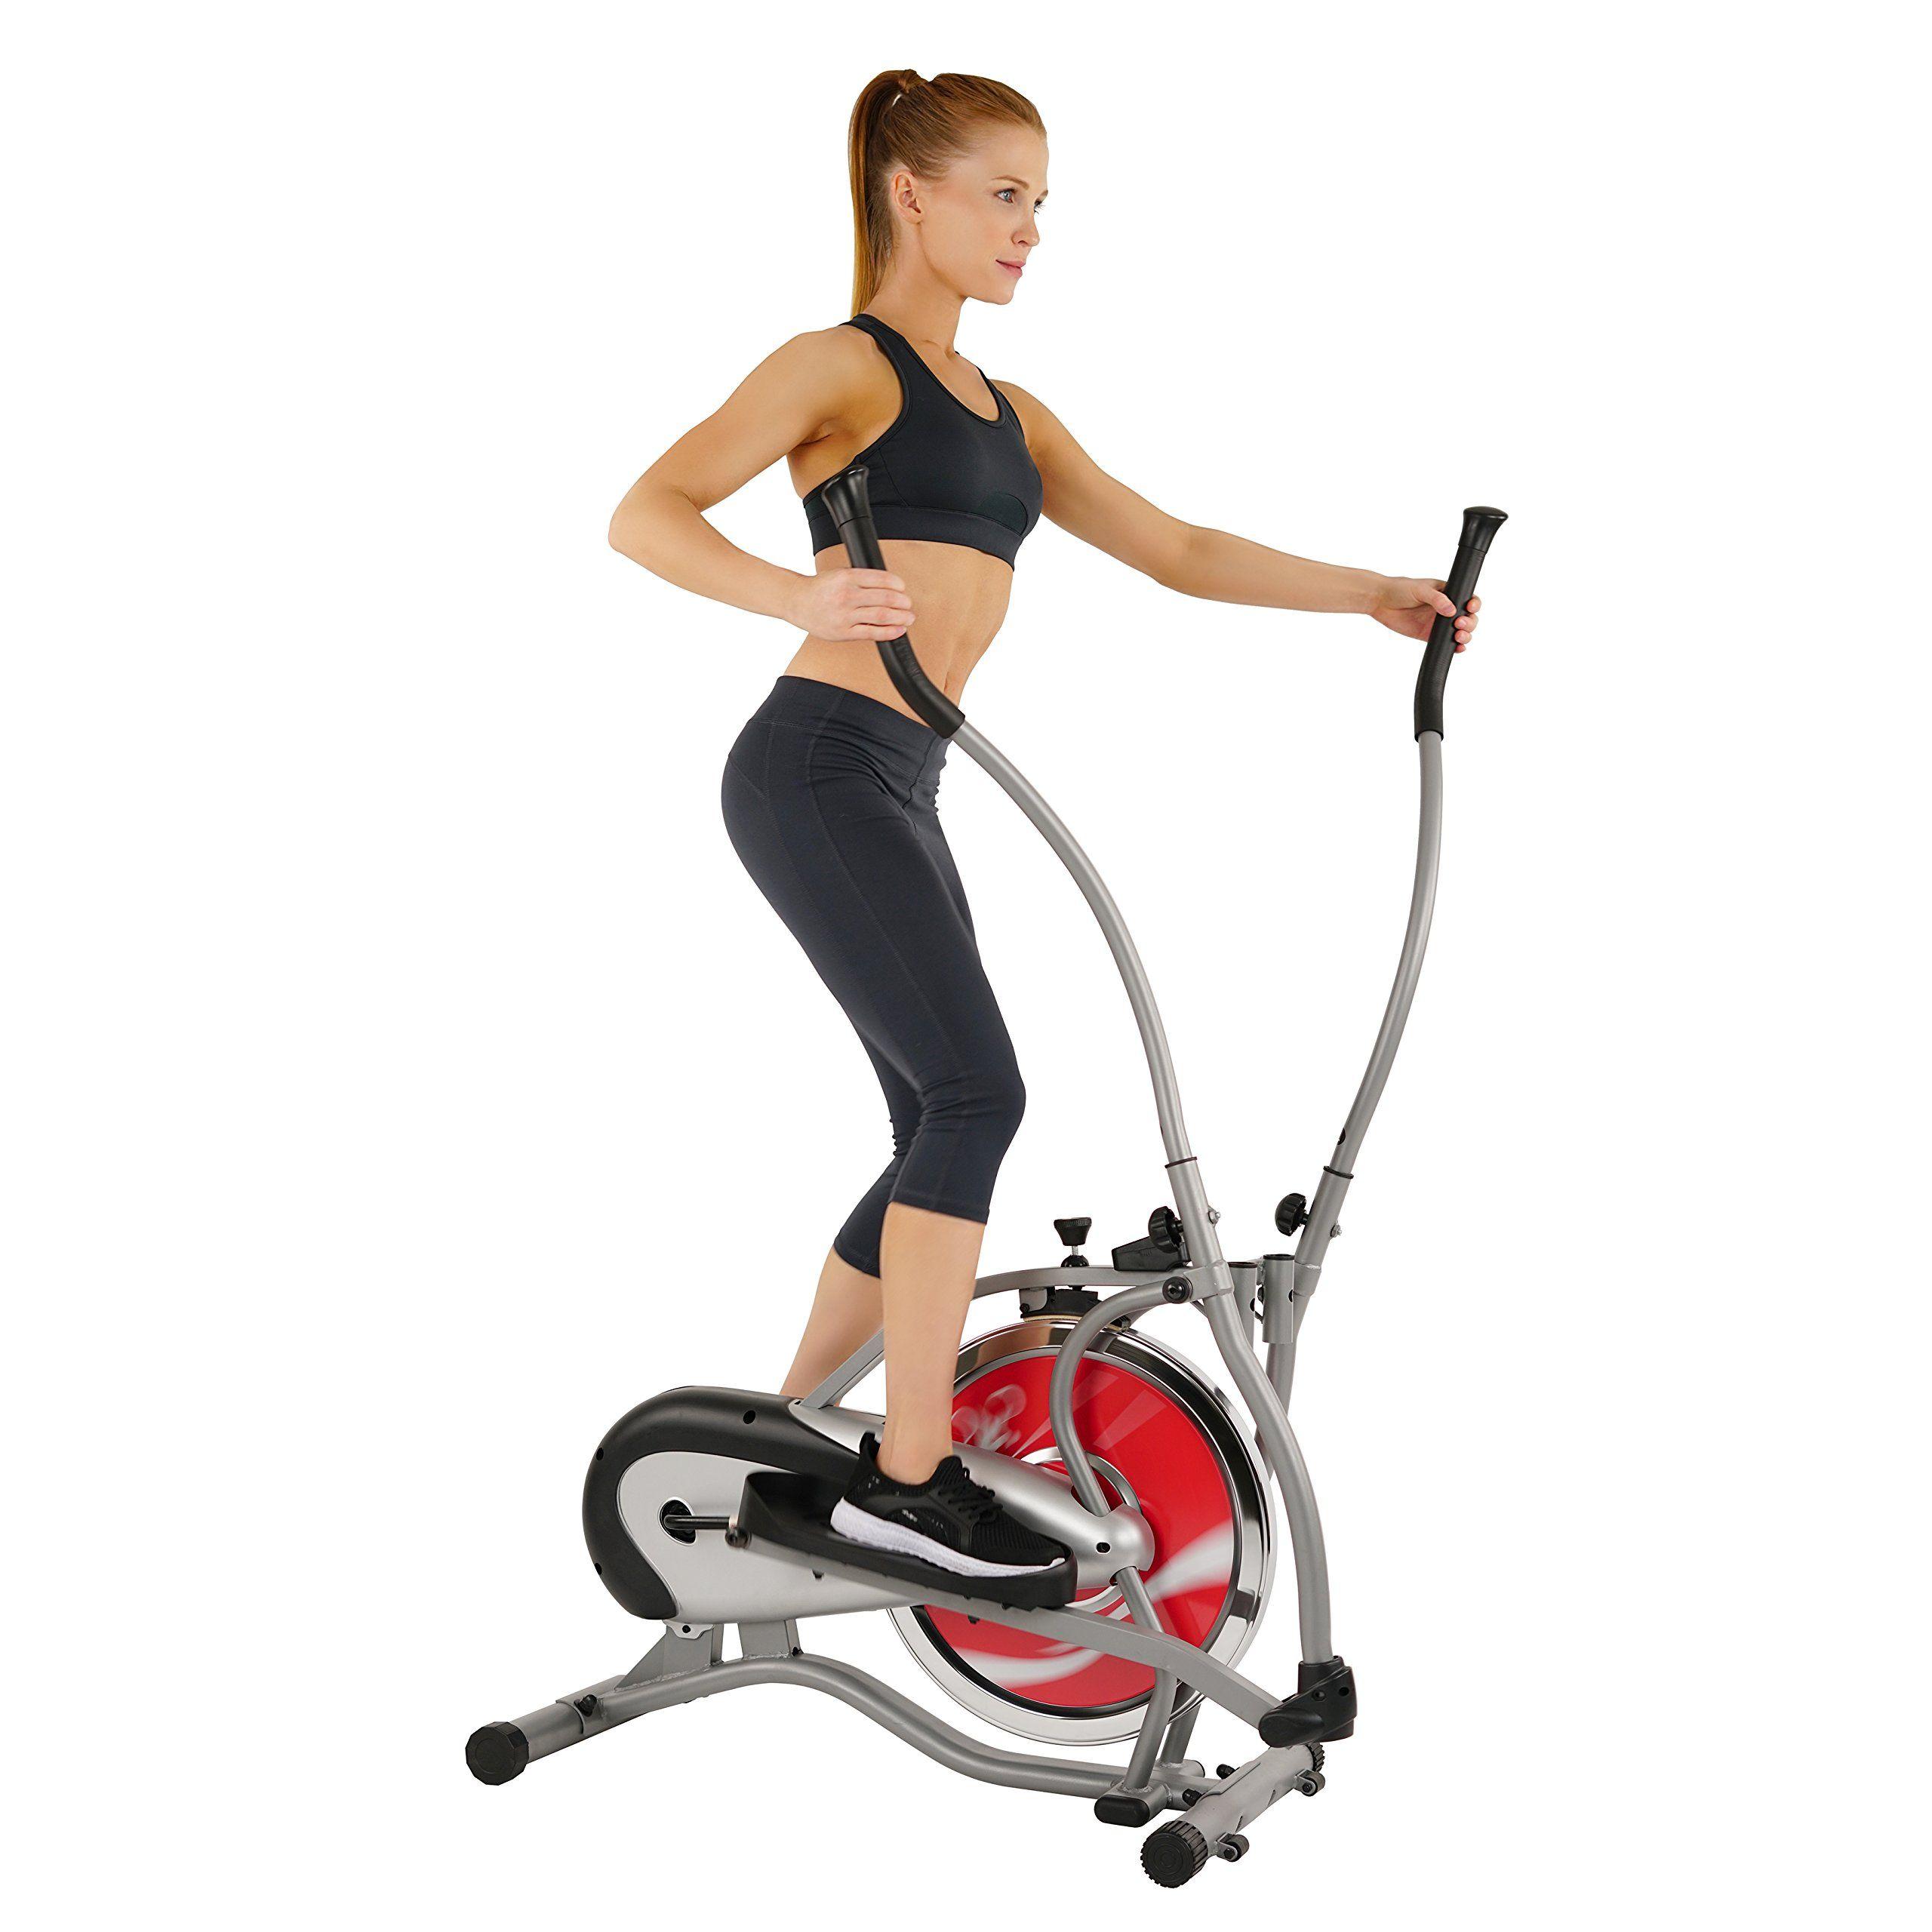 Sunny Health and Fitness SFE1405 Flywheel Elliptical